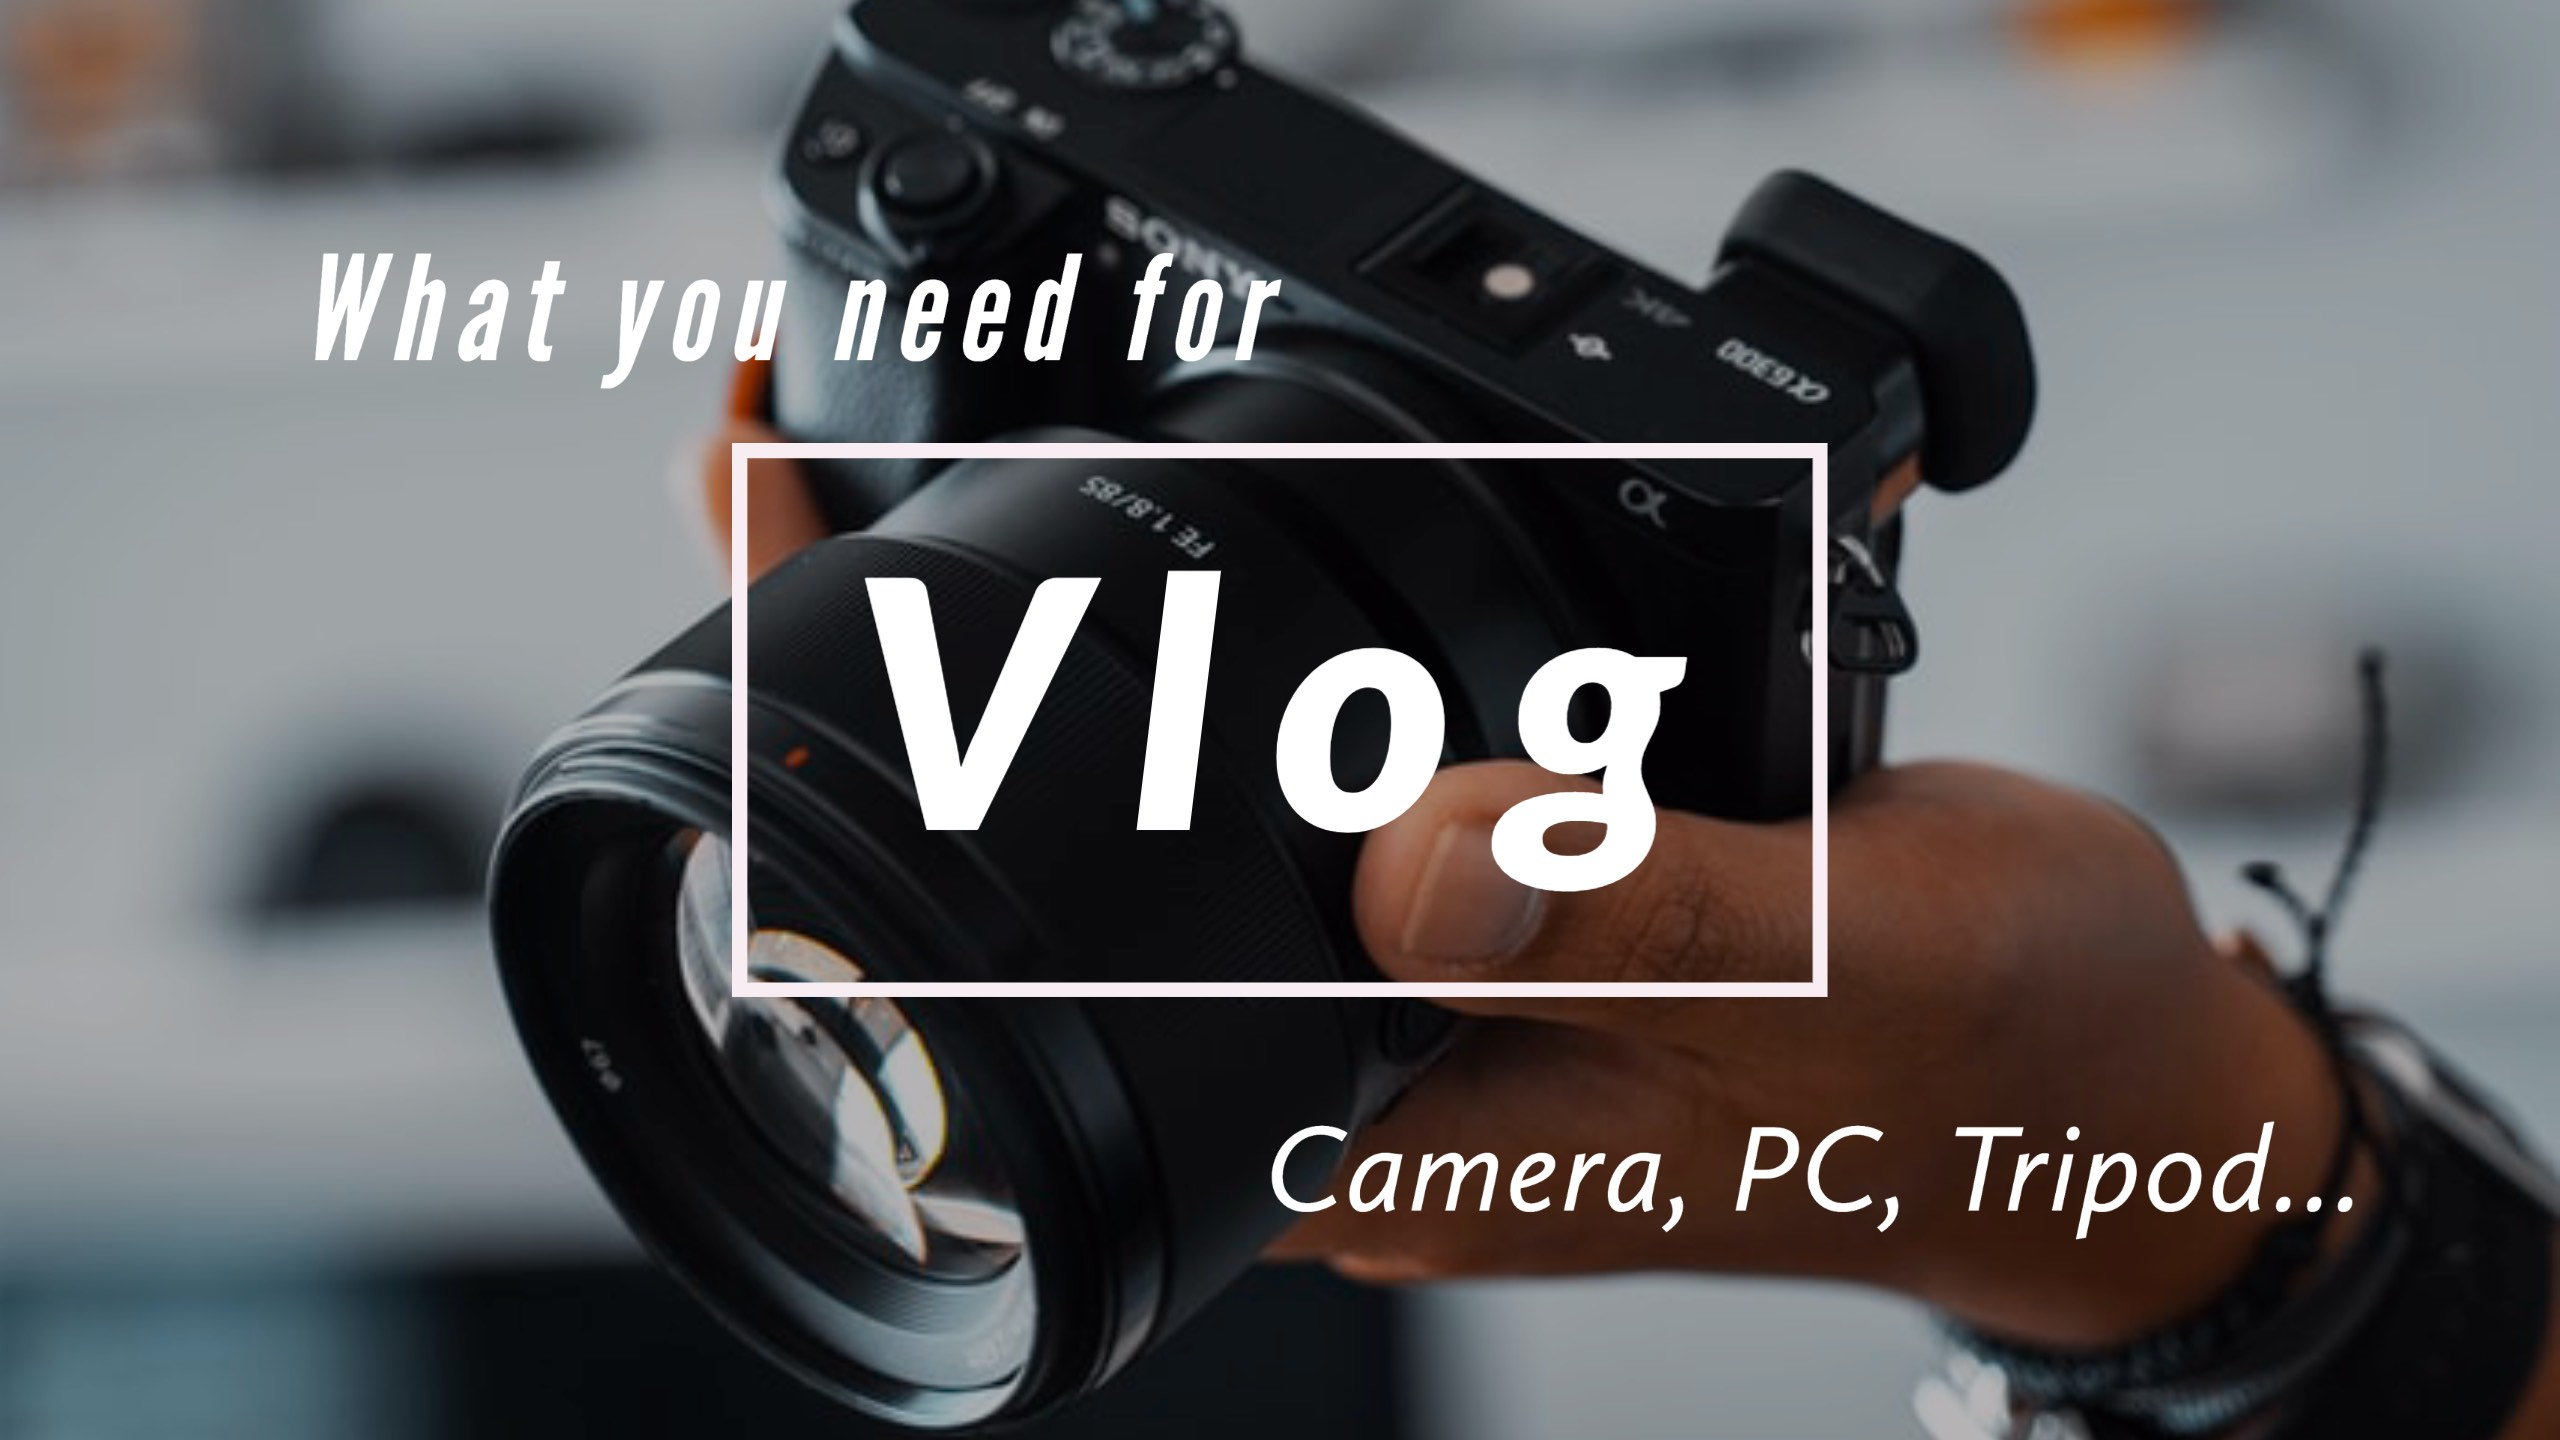 【Vlogの始め方】必要orあると便利なカメラ機材や編集ソフトを解説!【初心者向け】